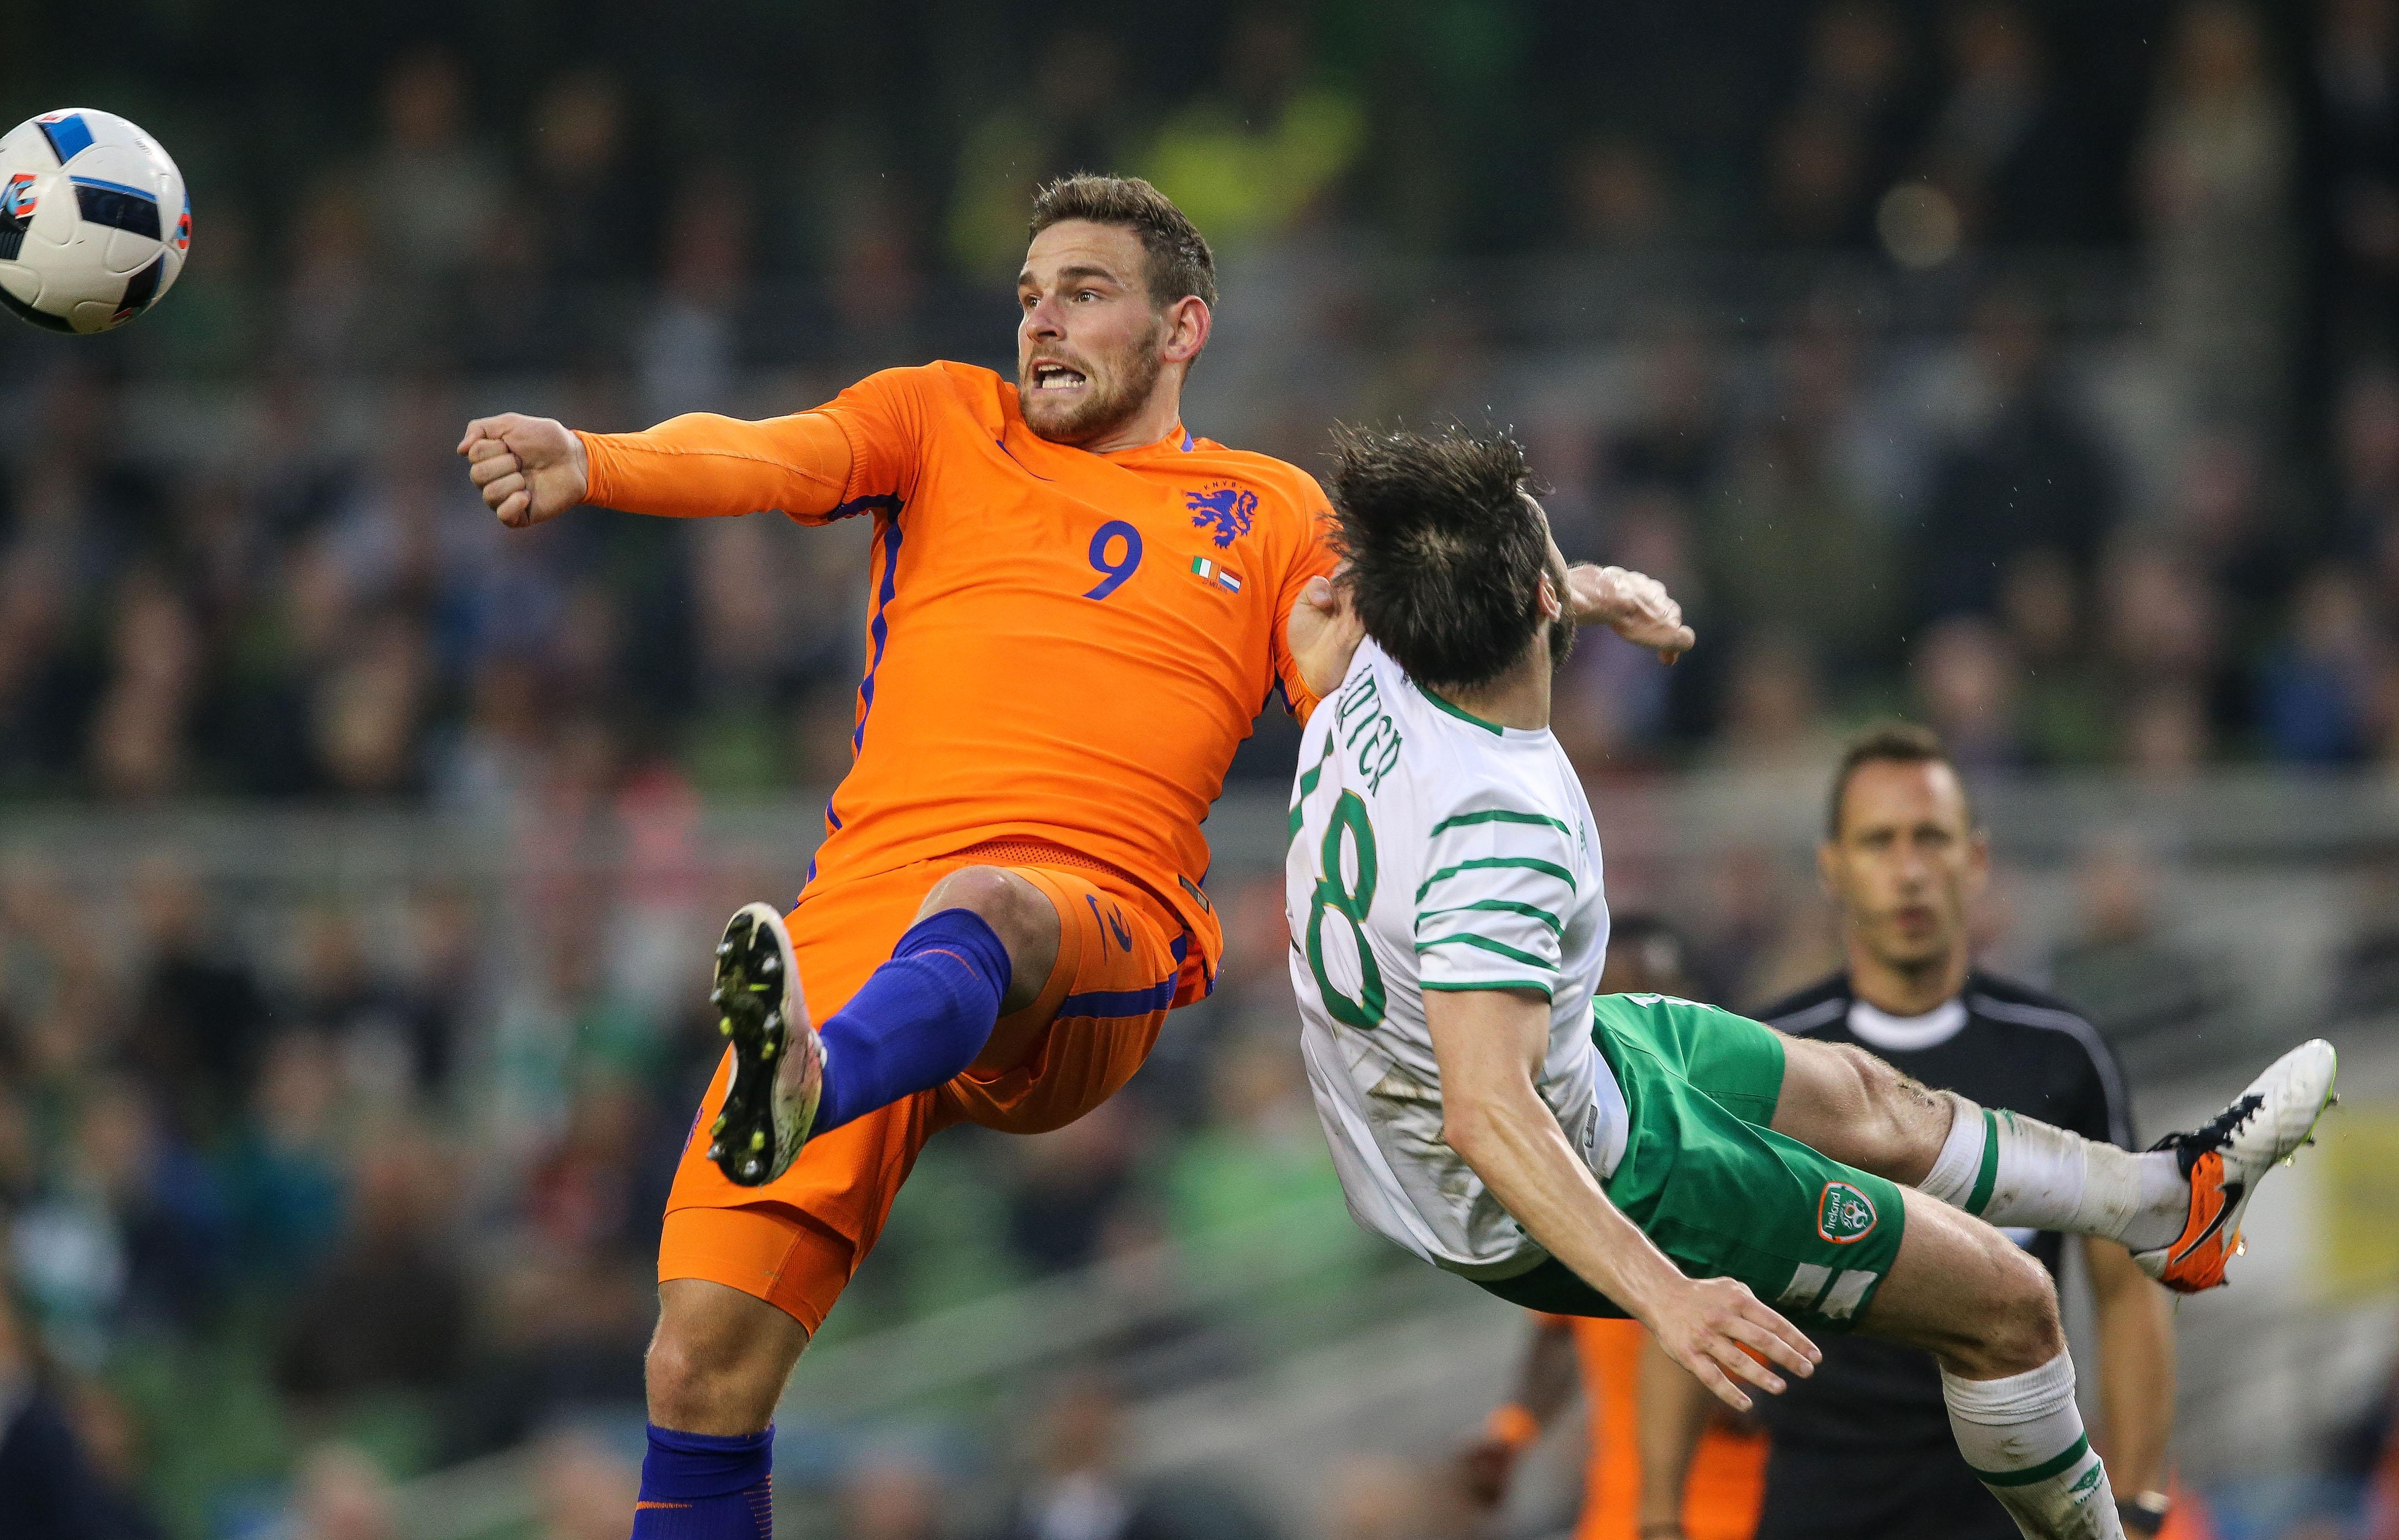 Spurs sign hotshot Dutch striker Vincent Janssen